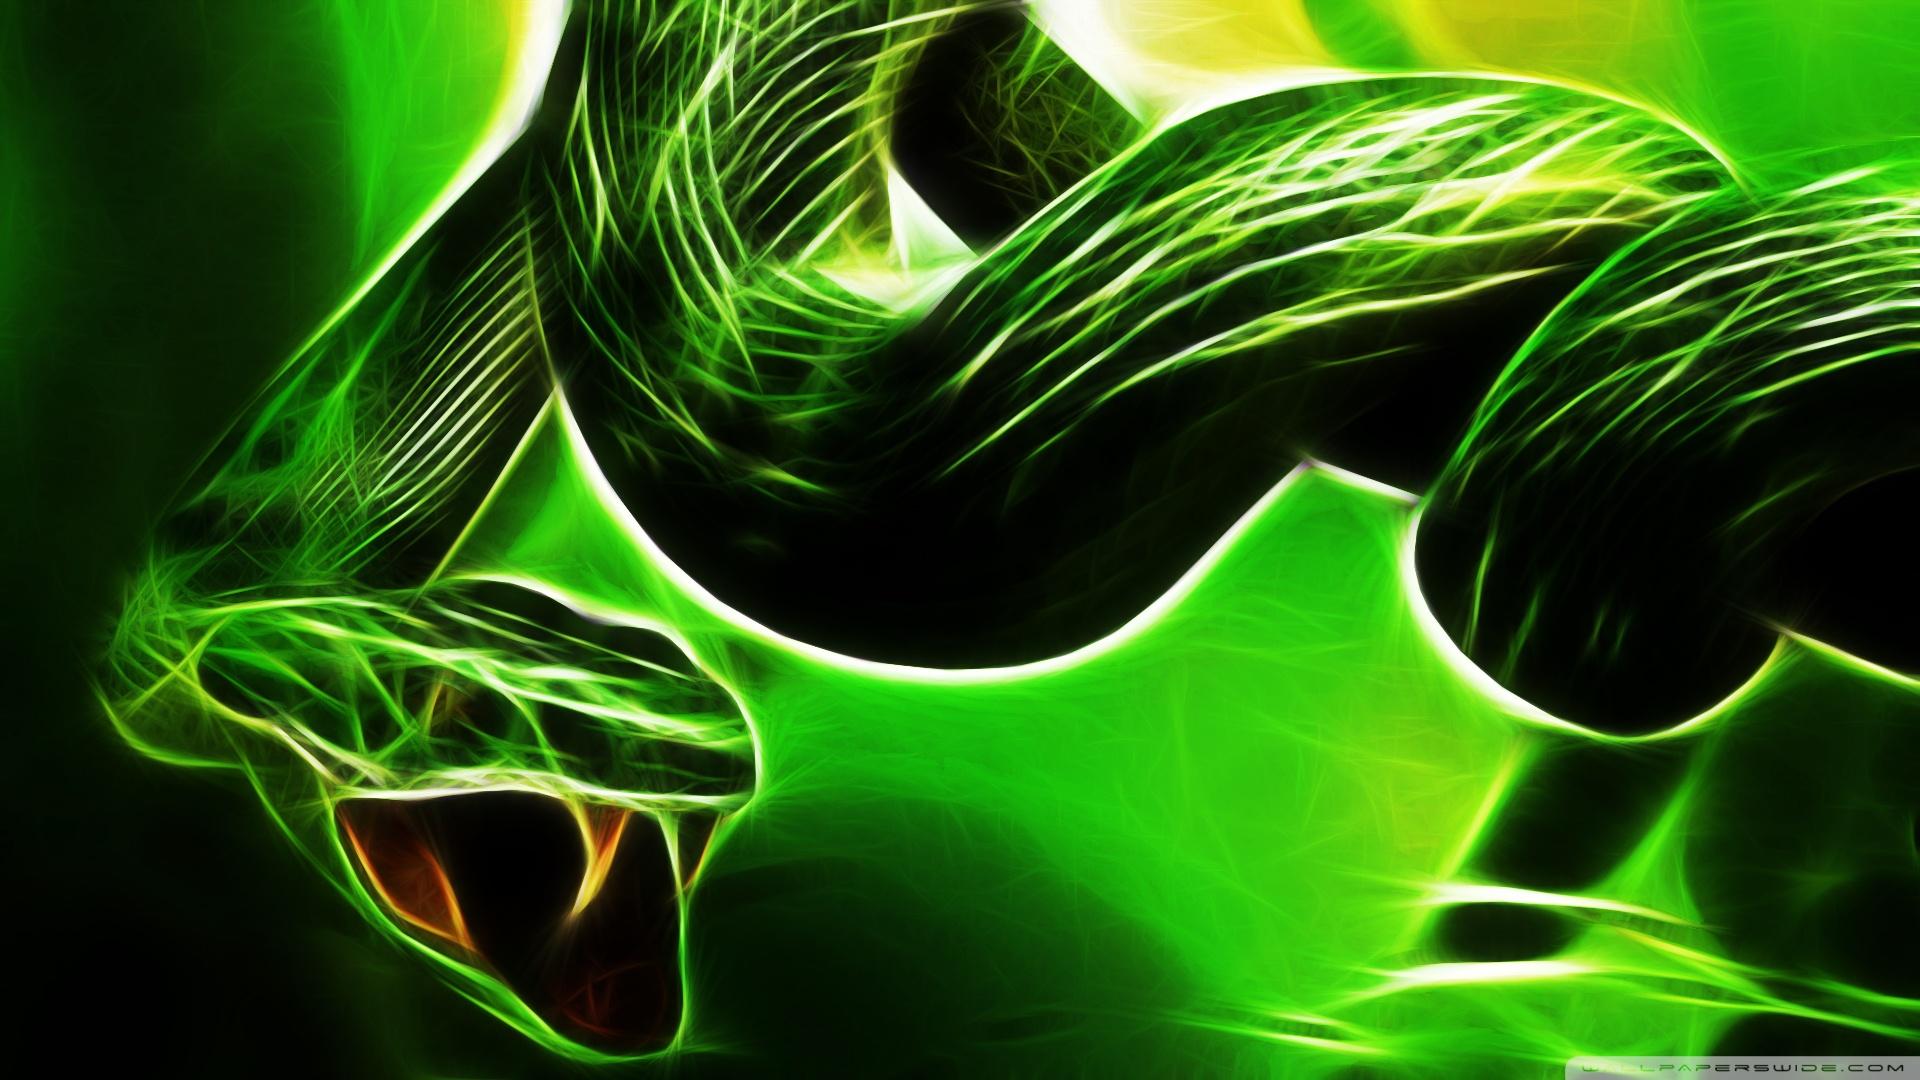 Fantasy Snake Wallpaper Download 1920x1080